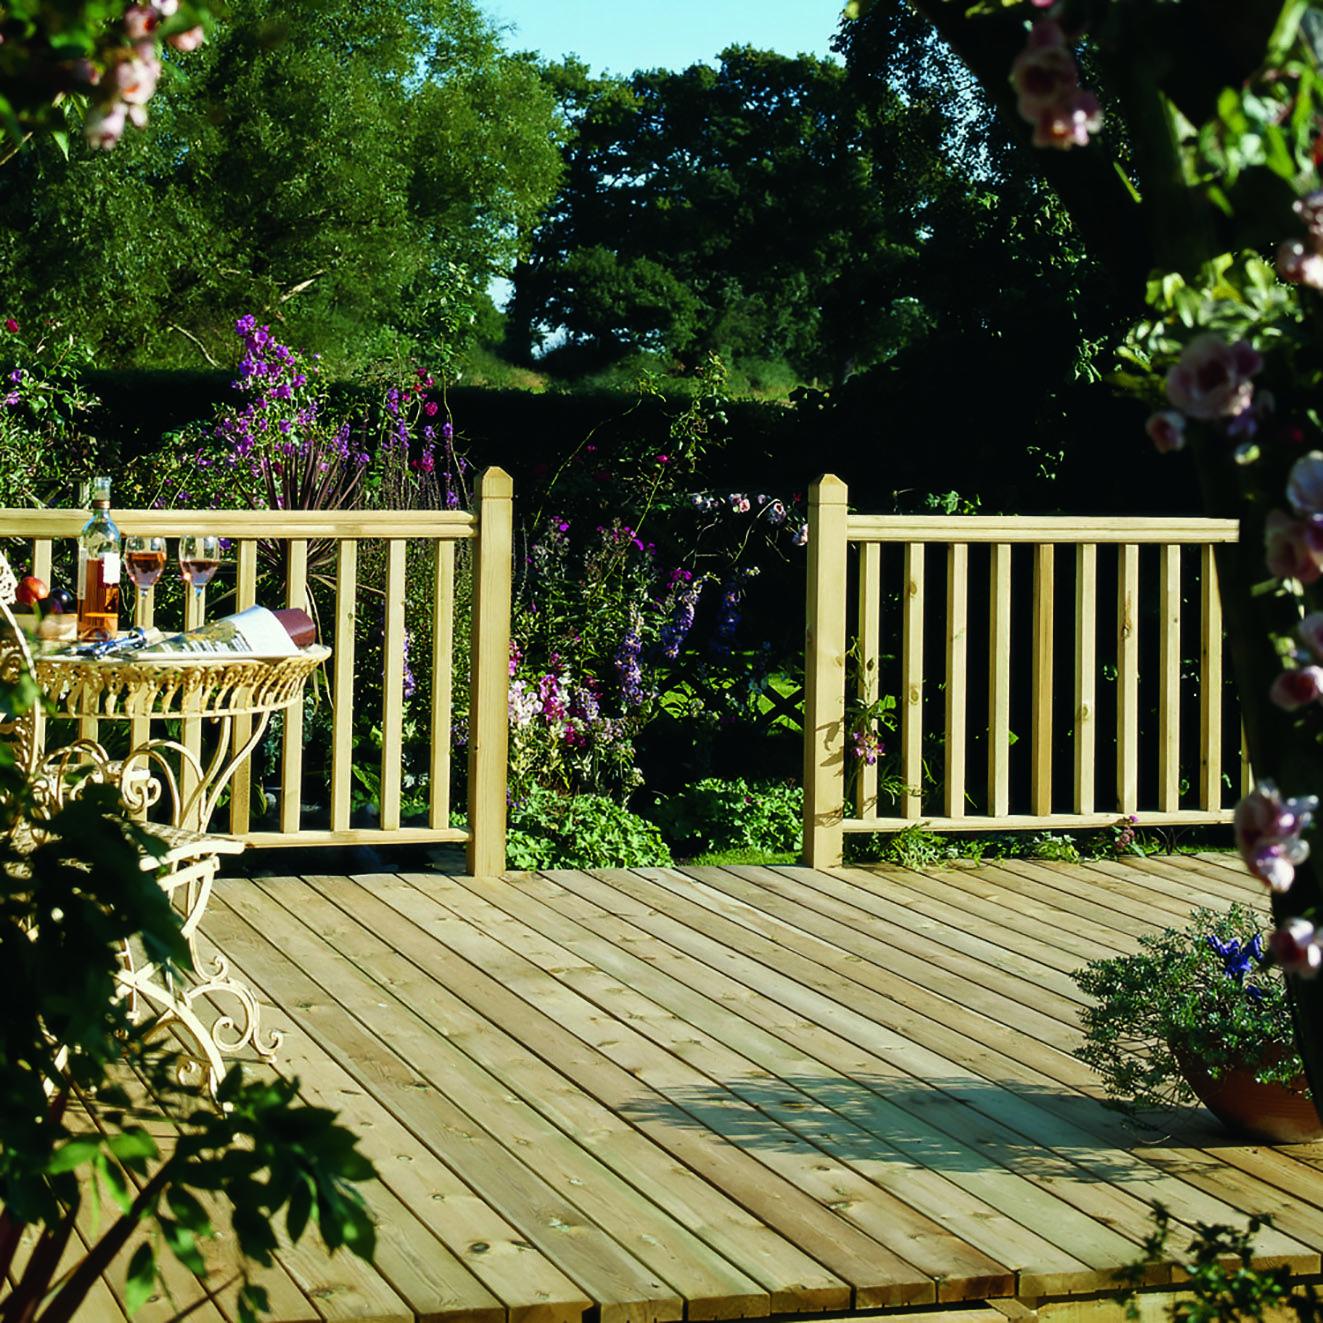 Garden Ideas Designs And Inspiration: Beautiful Decking And Garden Design Ideas/inspiration